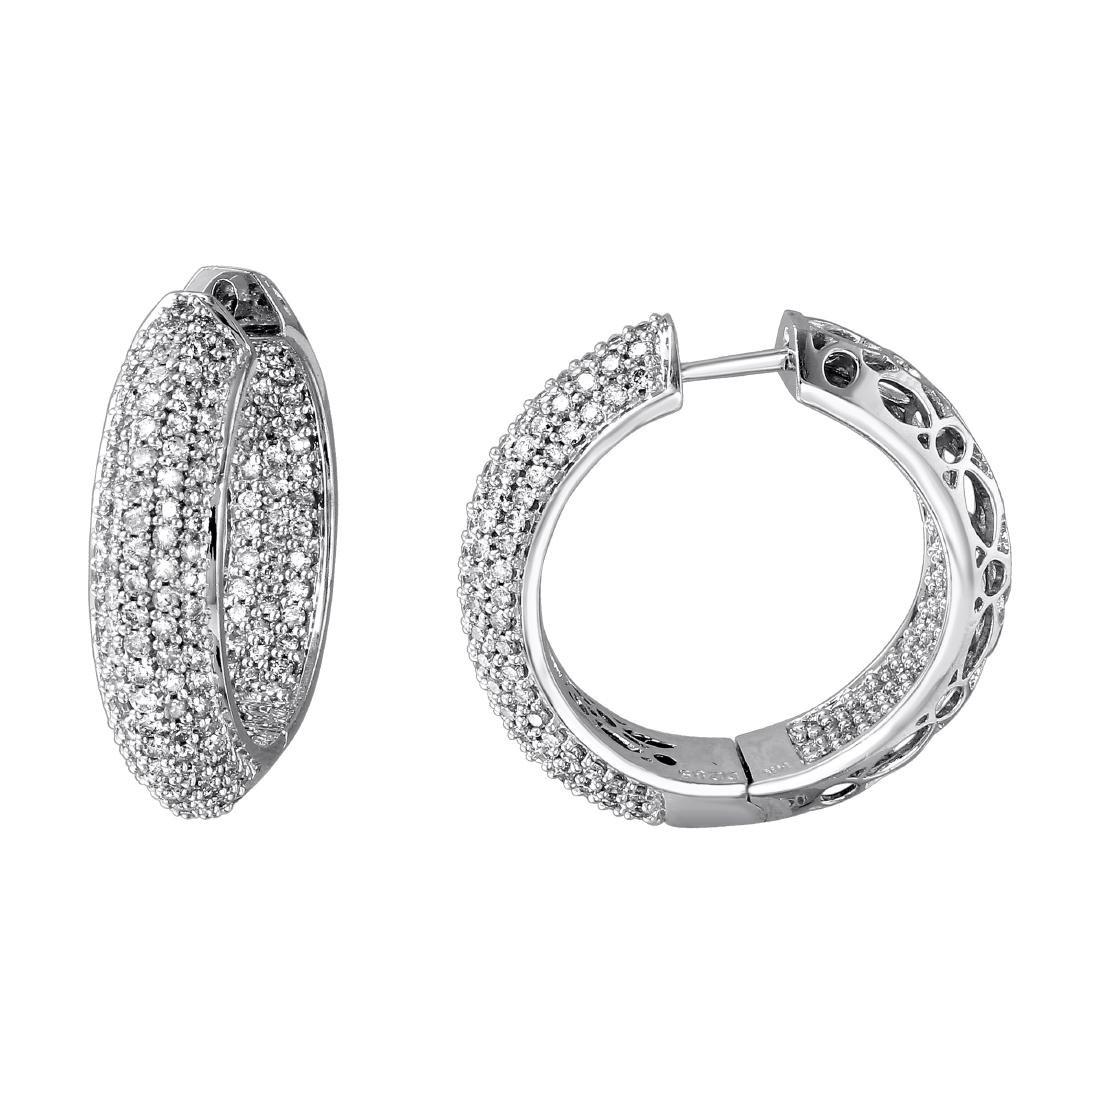 Genuine 2.85 TCW 14K White Gold Ladies Earring